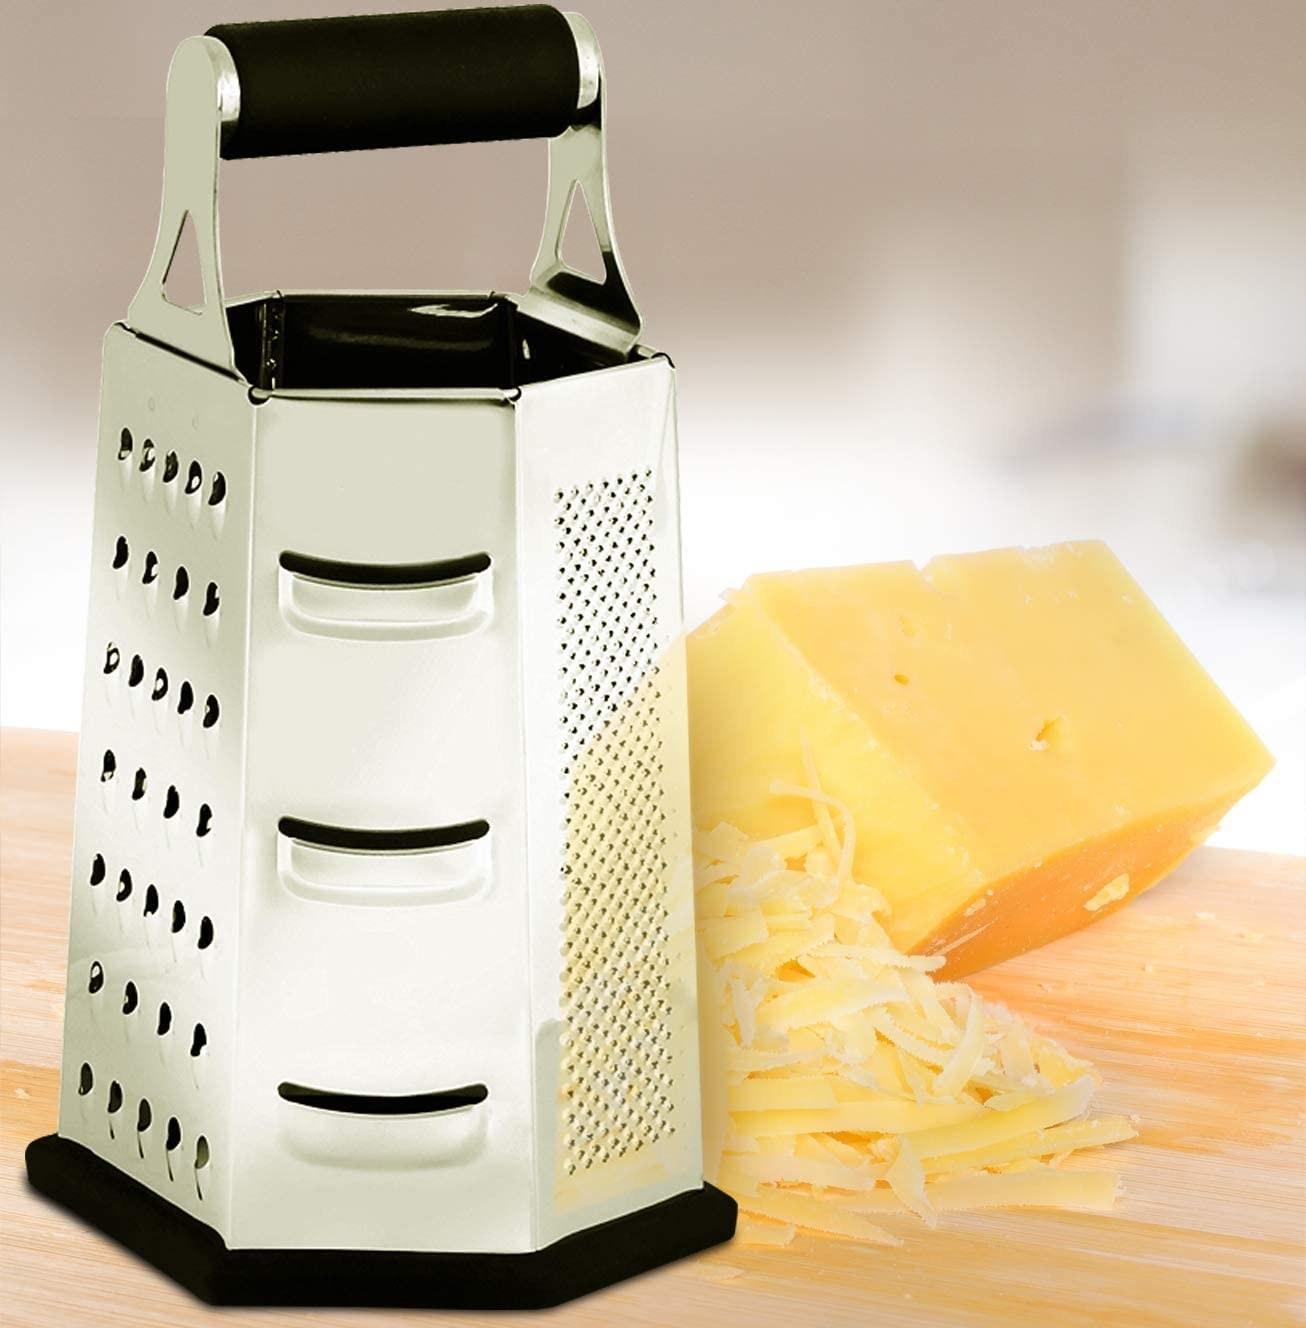 A hexagonal box grater beside grated cheese